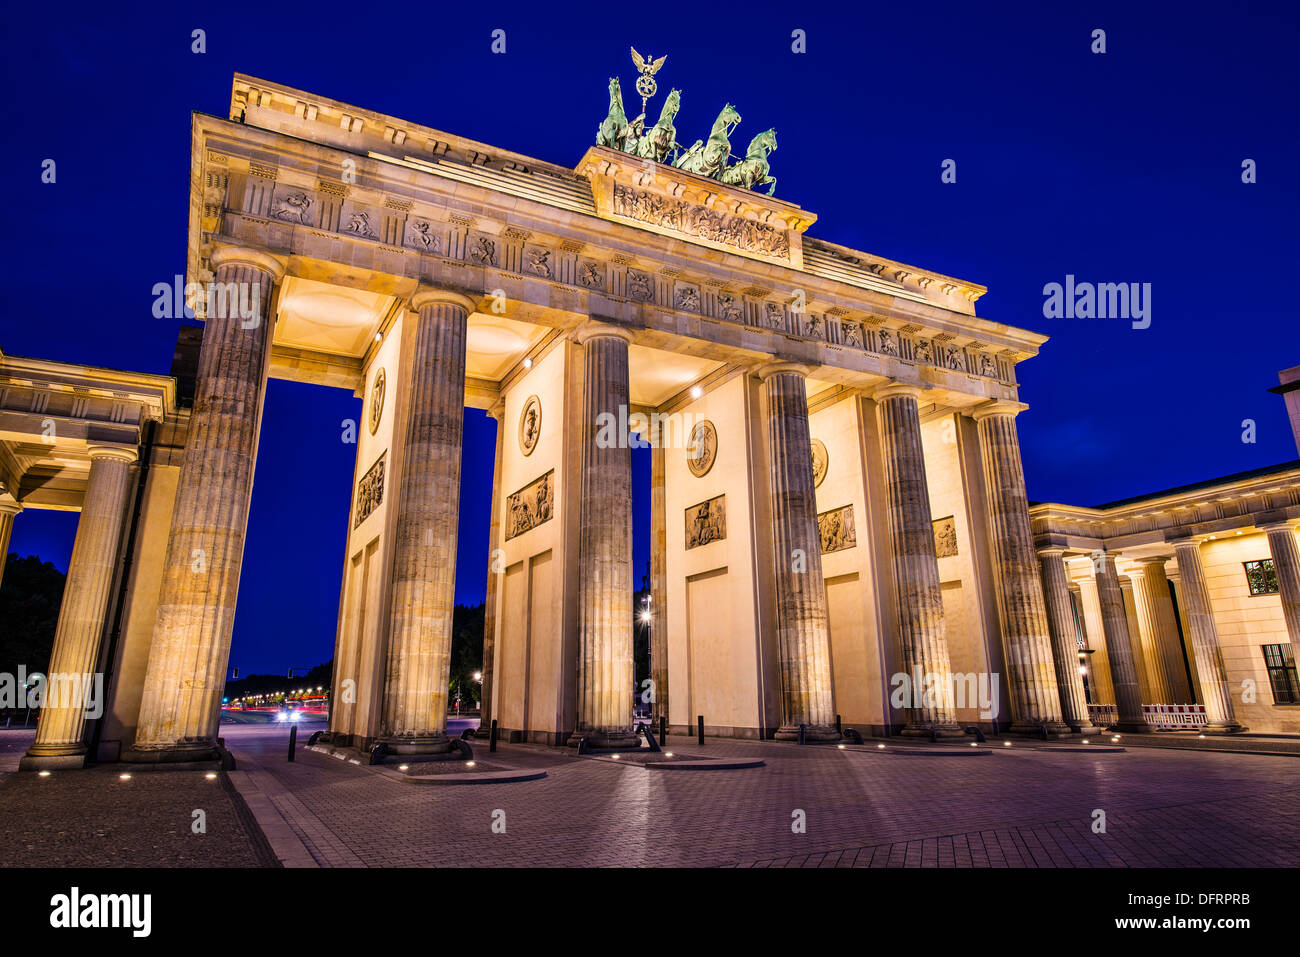 Brandenburg Gate in Berlin, Germany. Brandenburg Gate in Berlin, Germany. - Stock Image